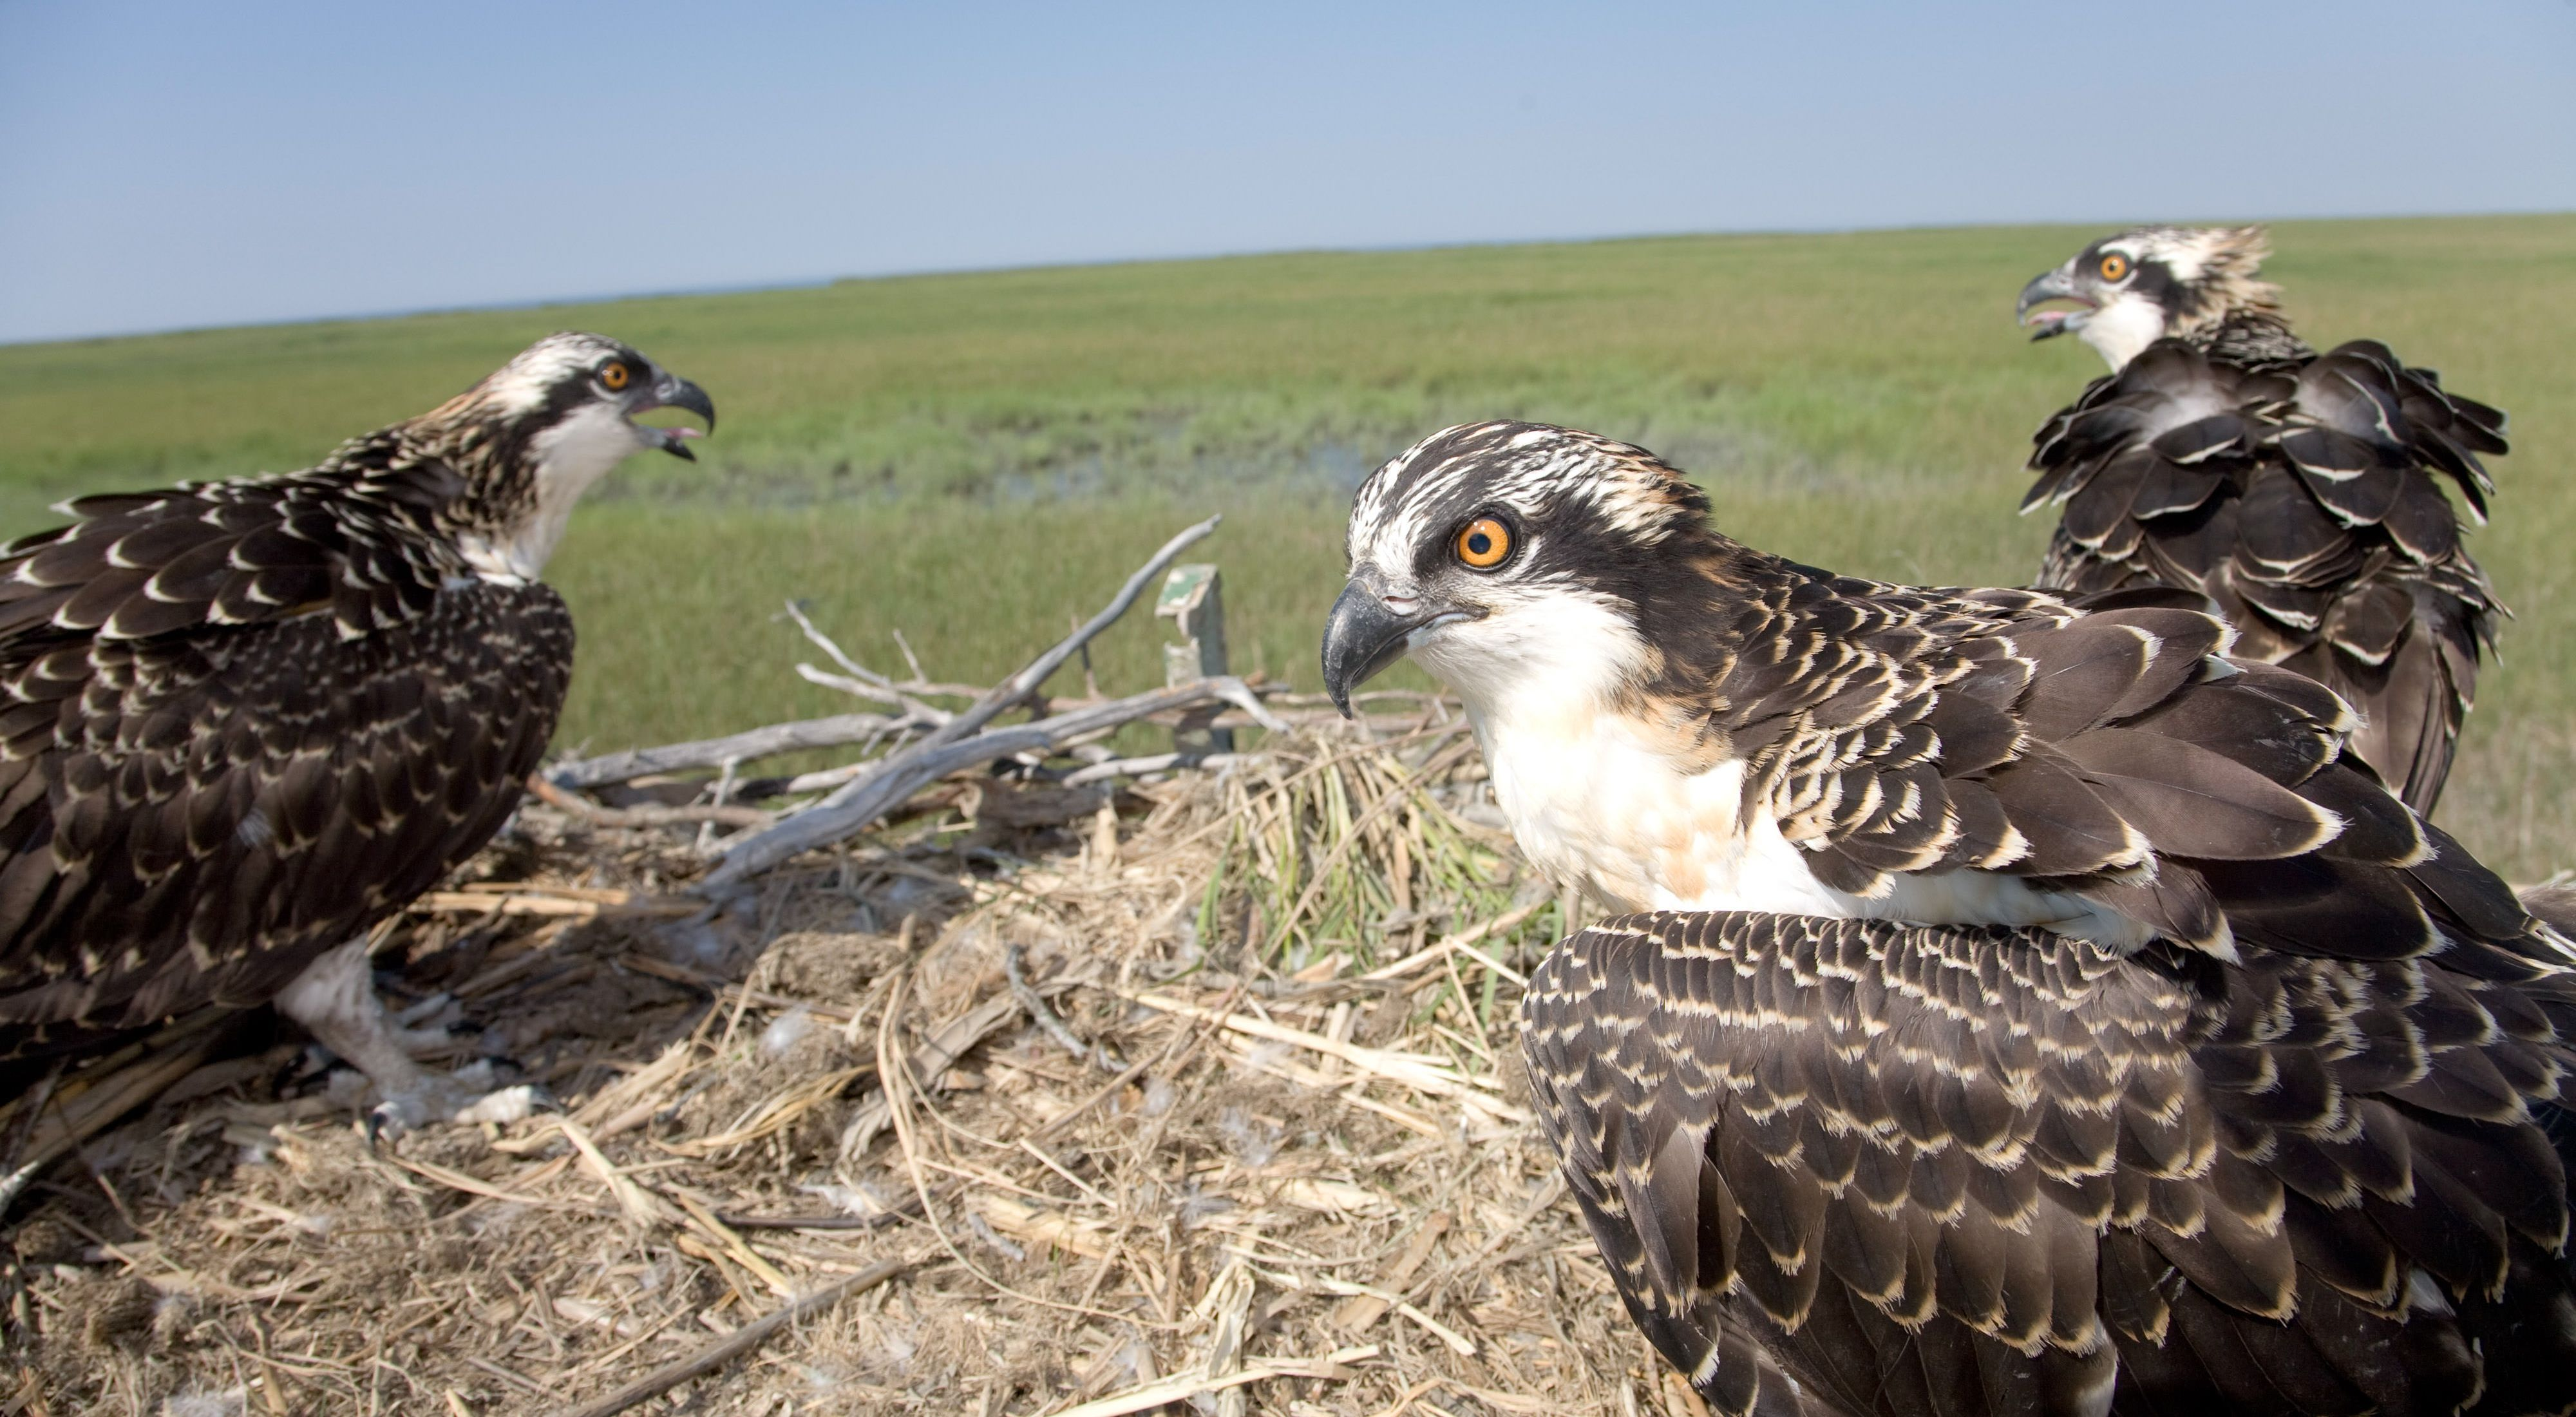 Nesting osprey in New Jersey